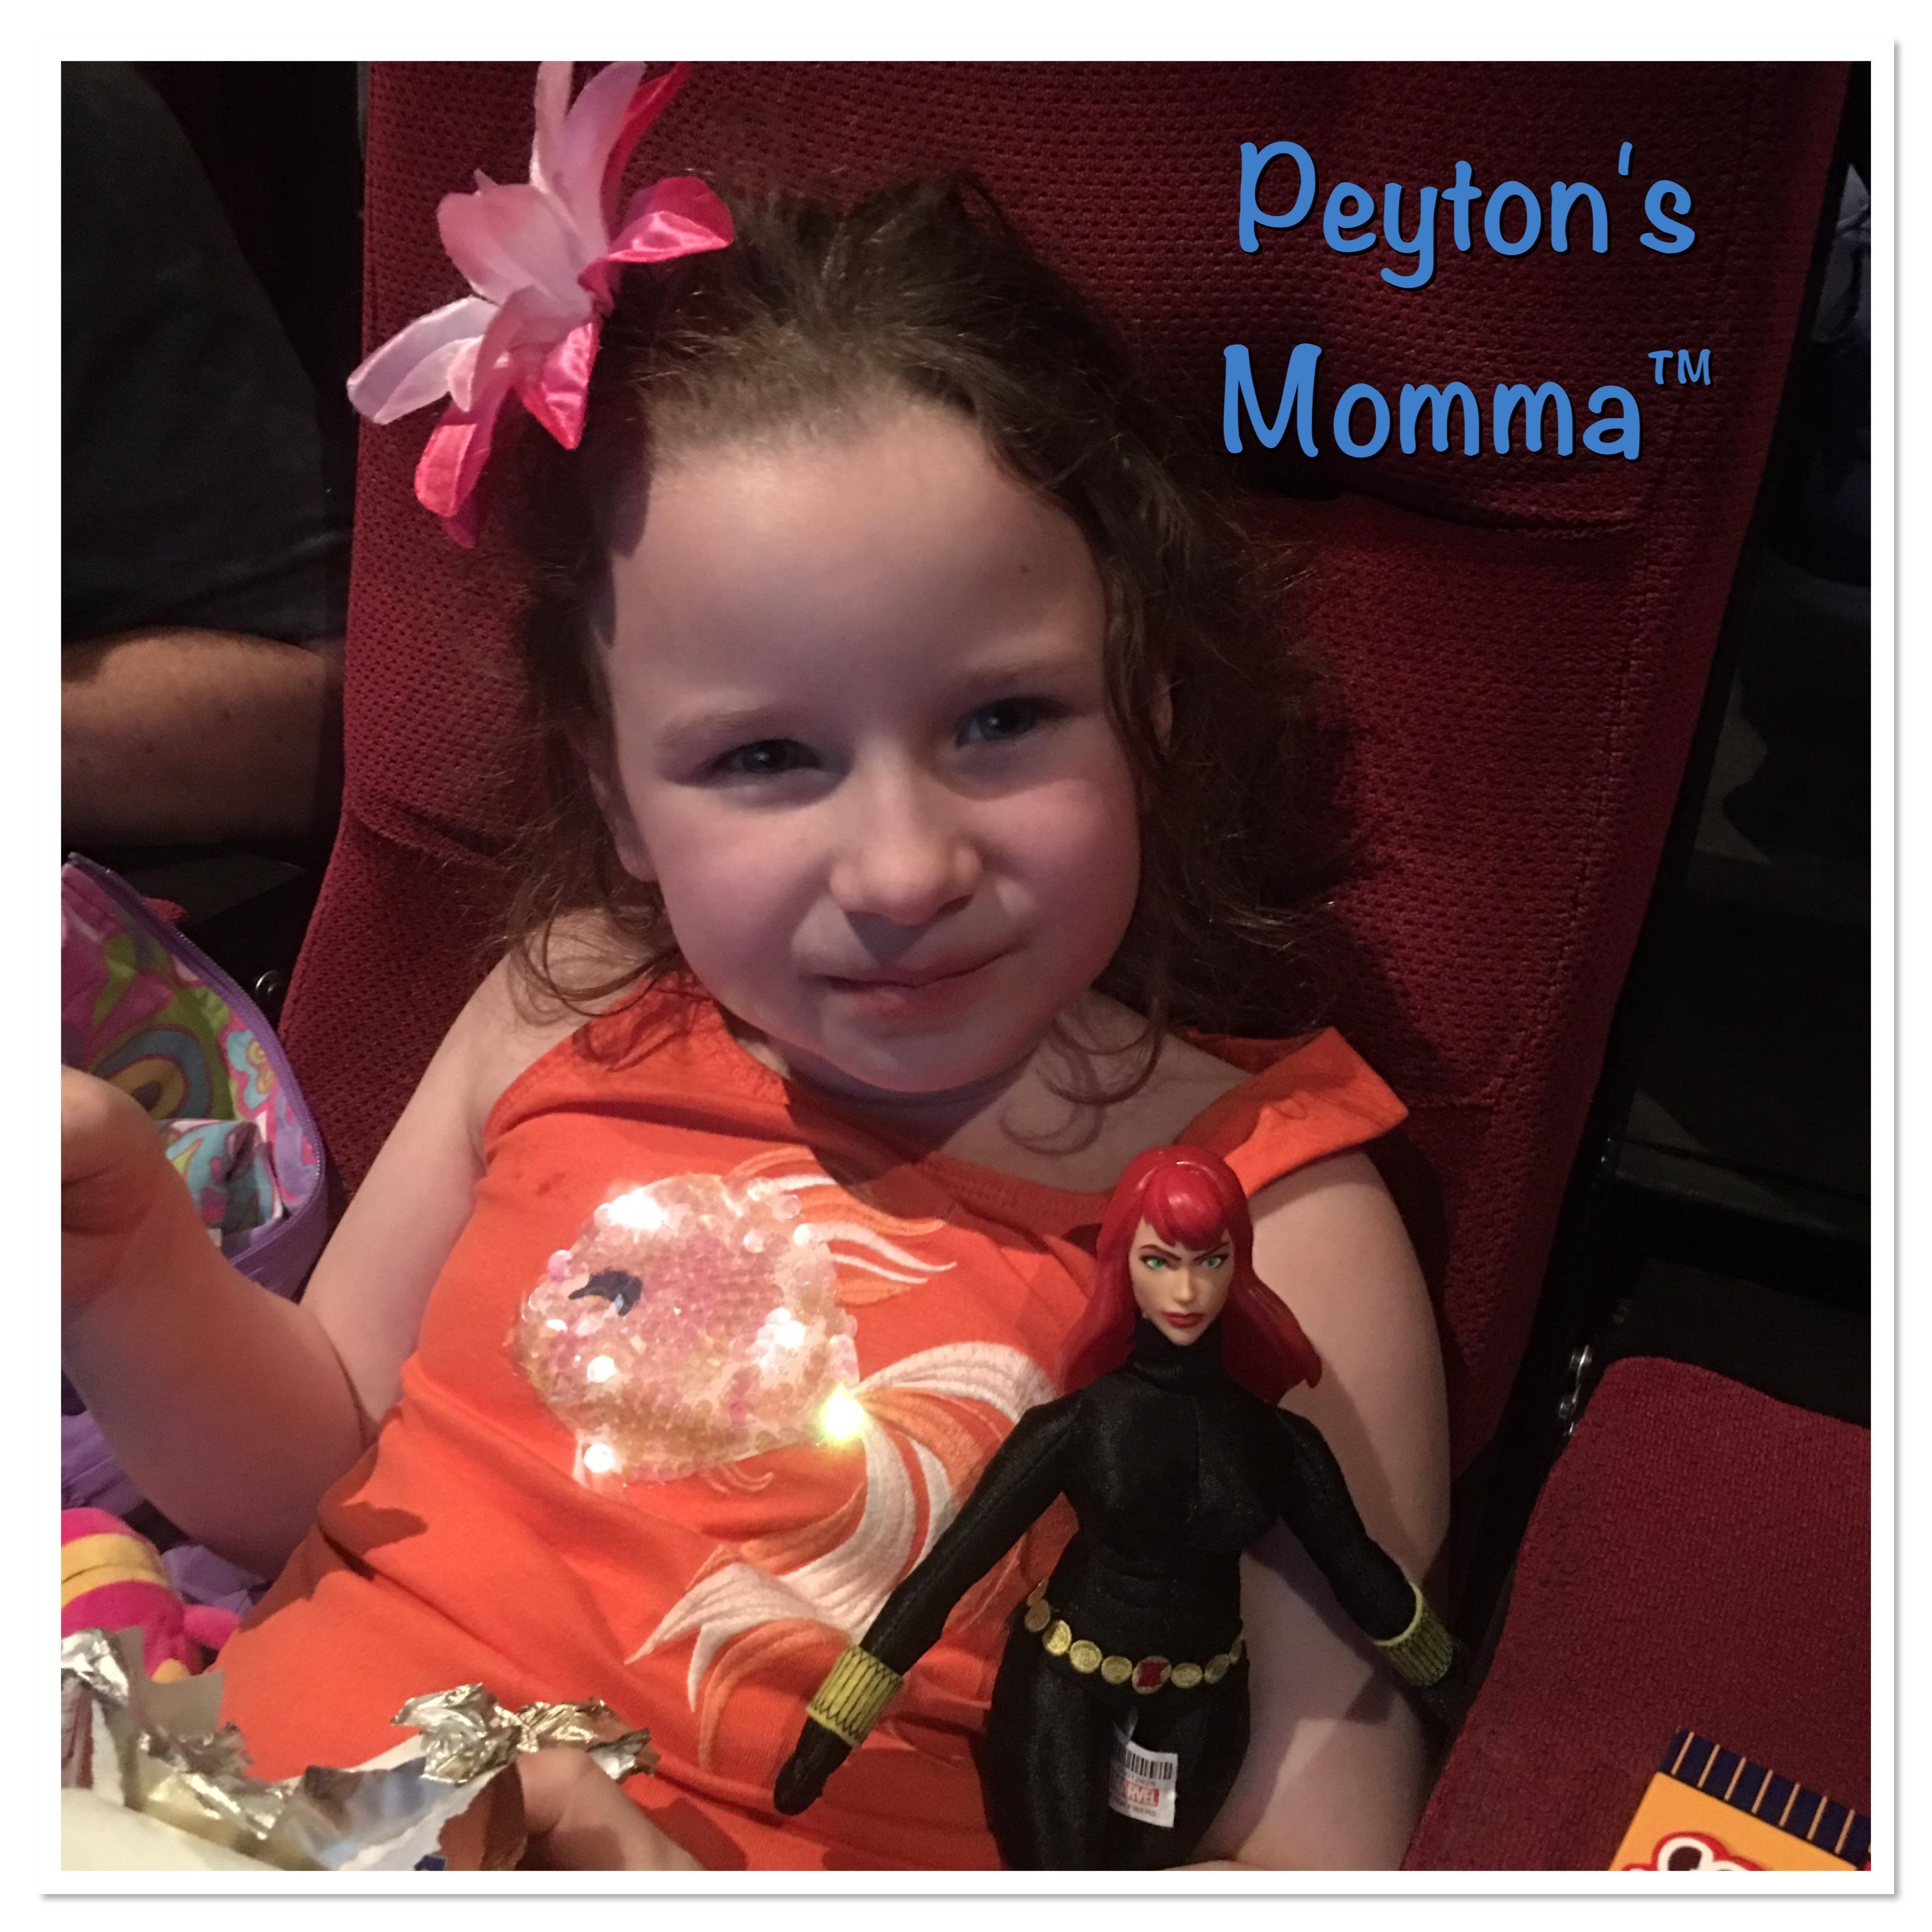 Peyton's Momma at Captain America Civil War